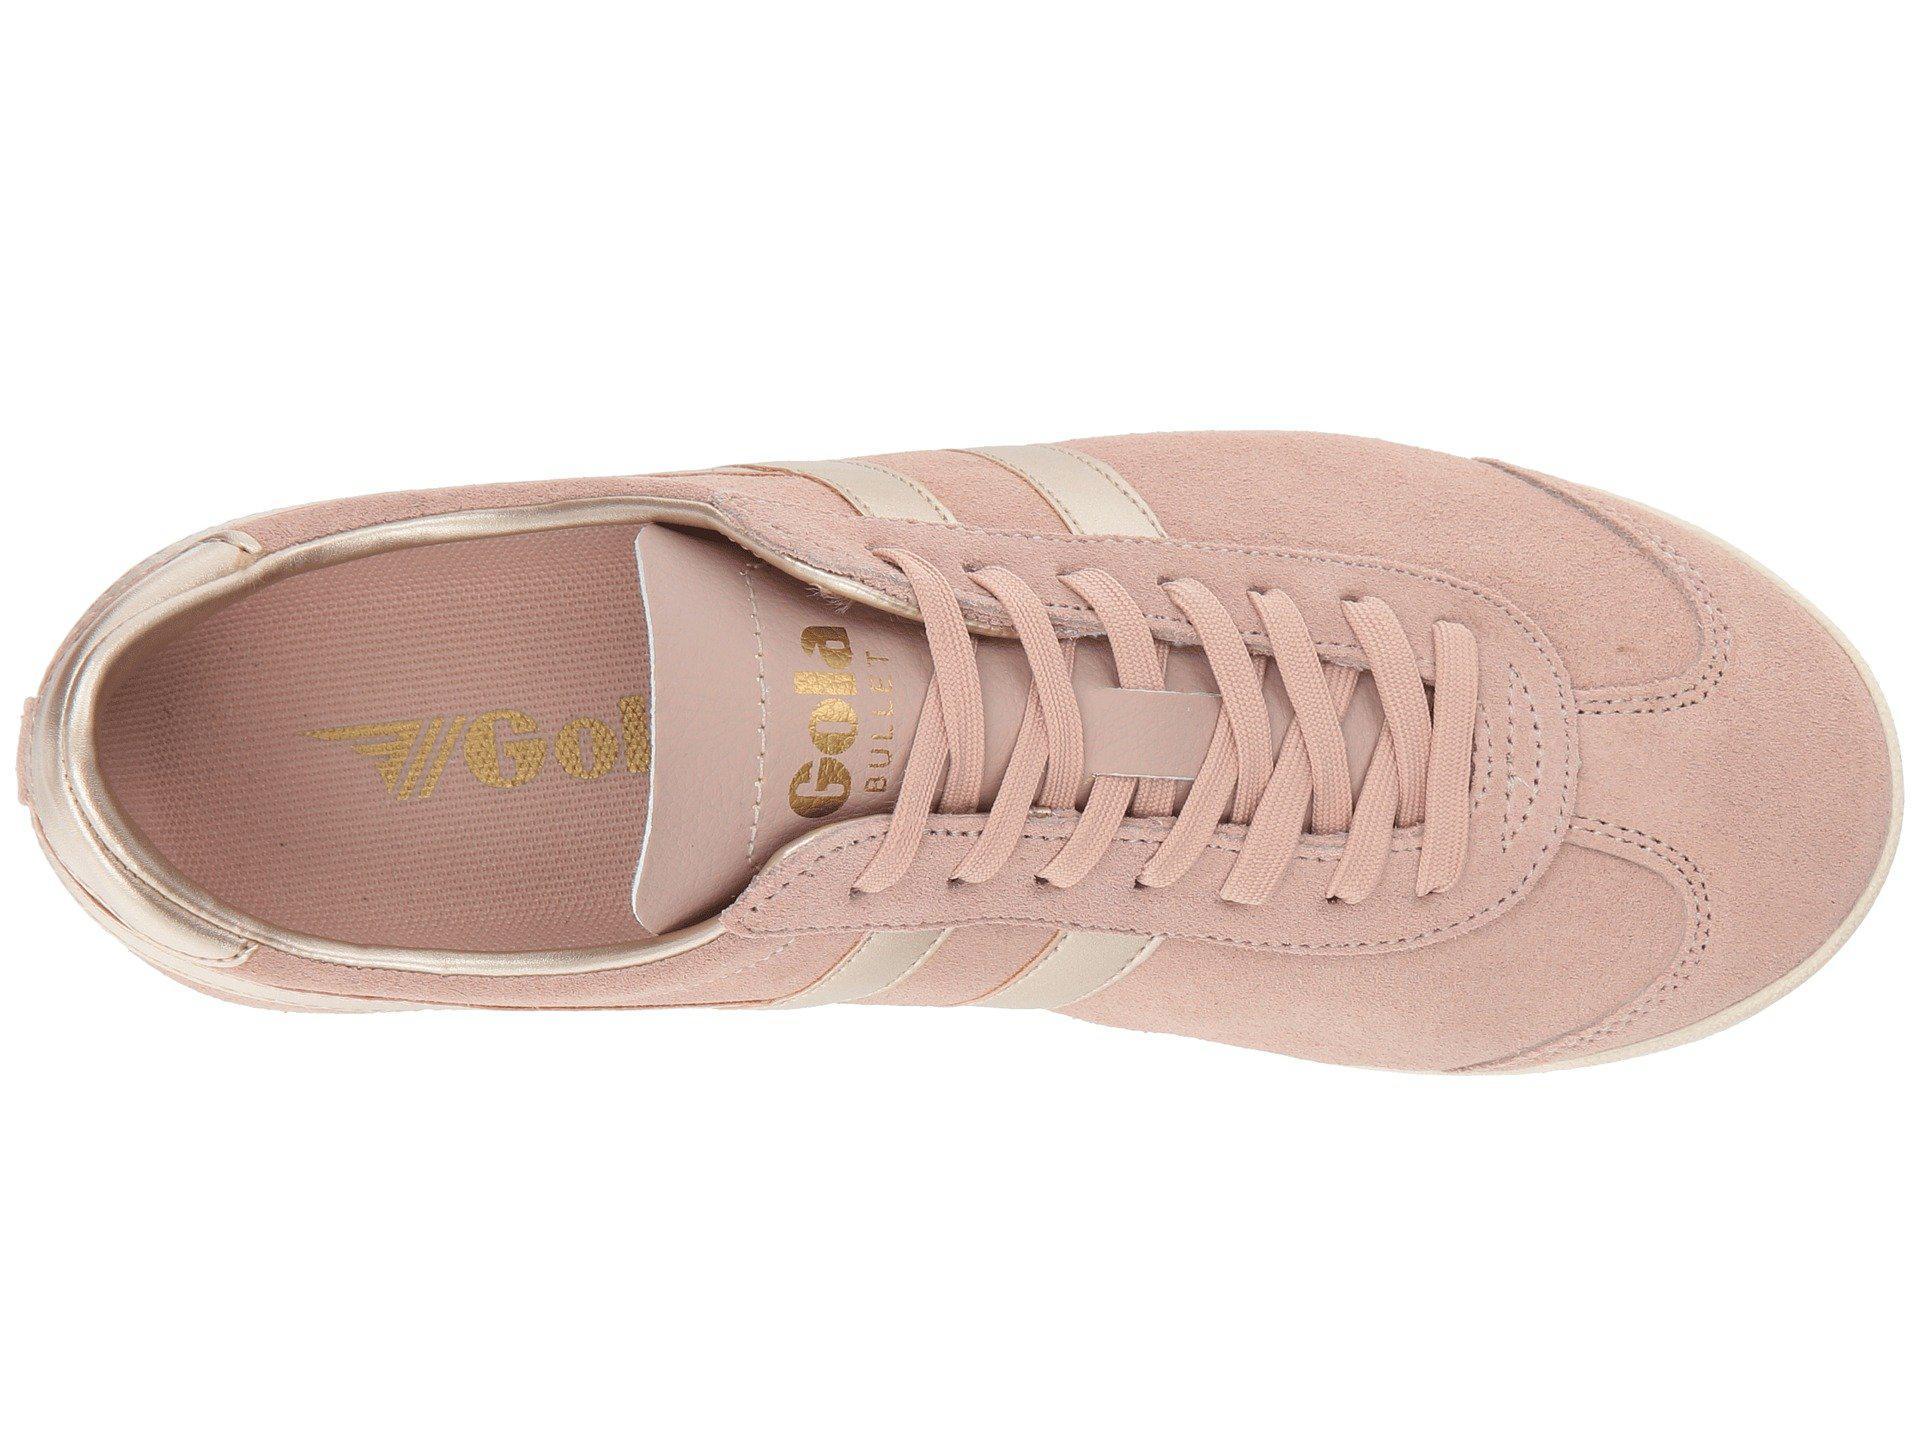 618621d17c6 Gola - Pink Bullet Pearl (windchime) Women s Shoes - Lyst. View fullscreen